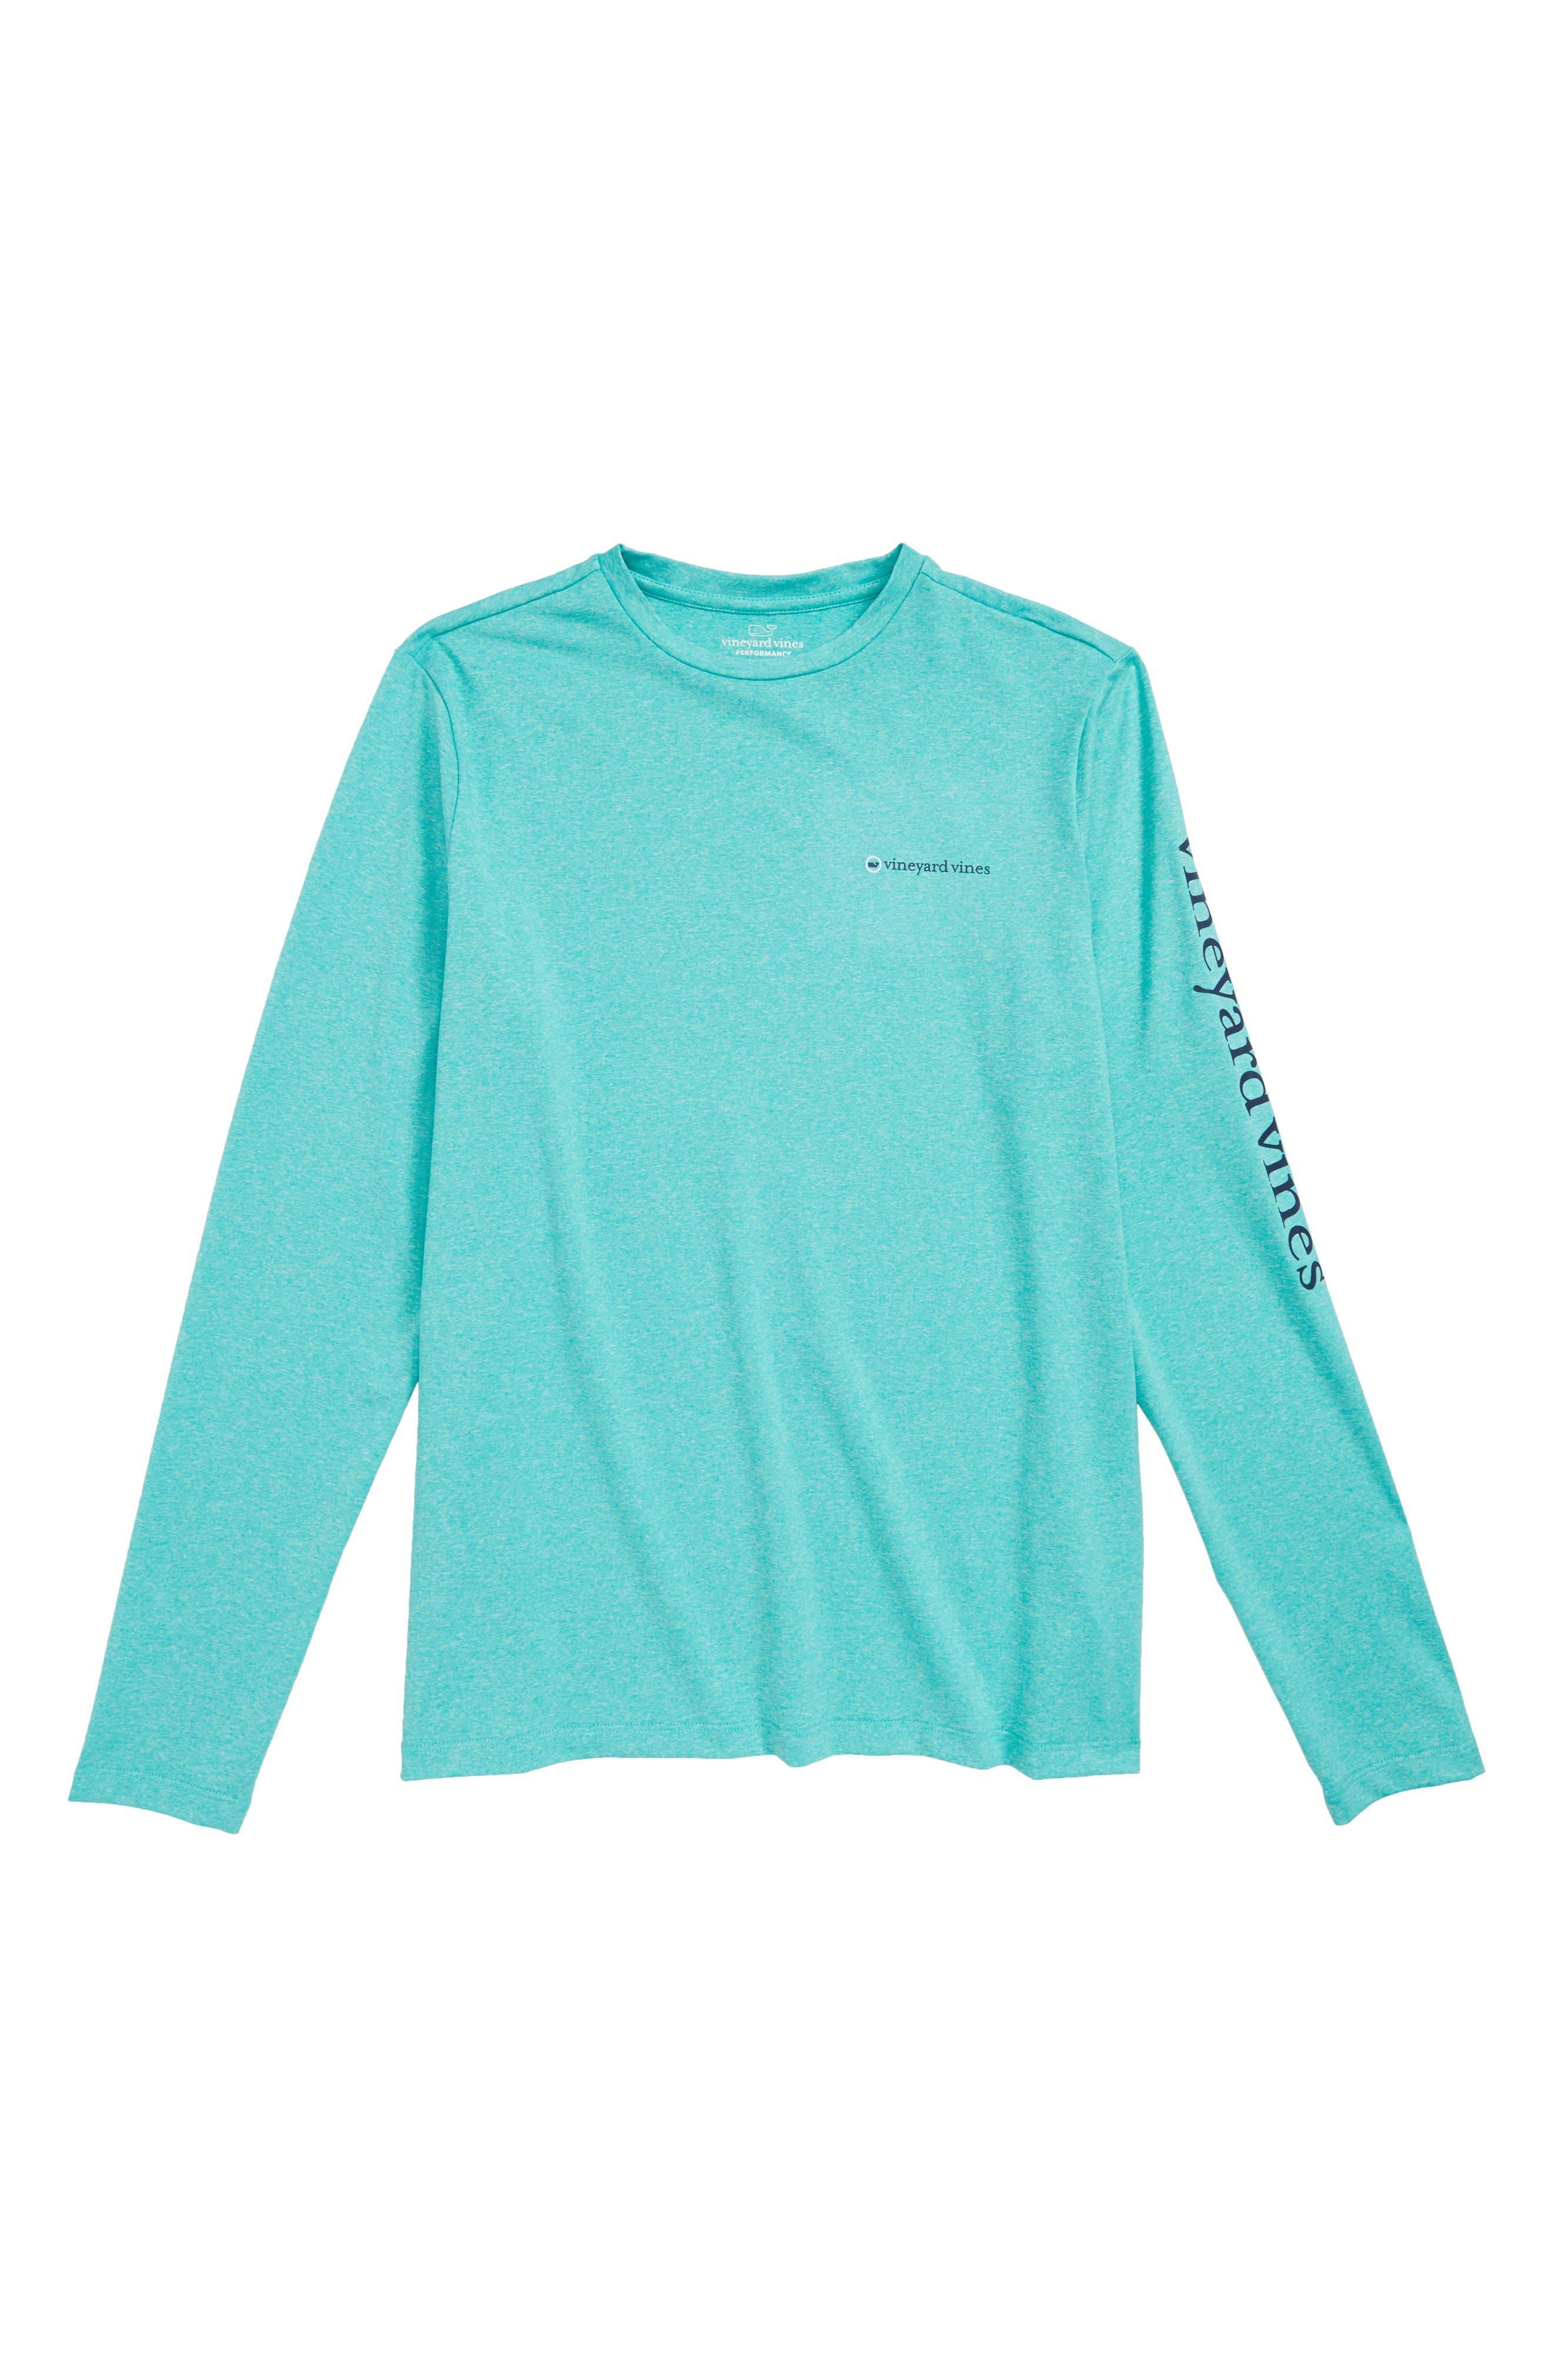 Performance Sport T-Shirt,                         Main,                         color, 440